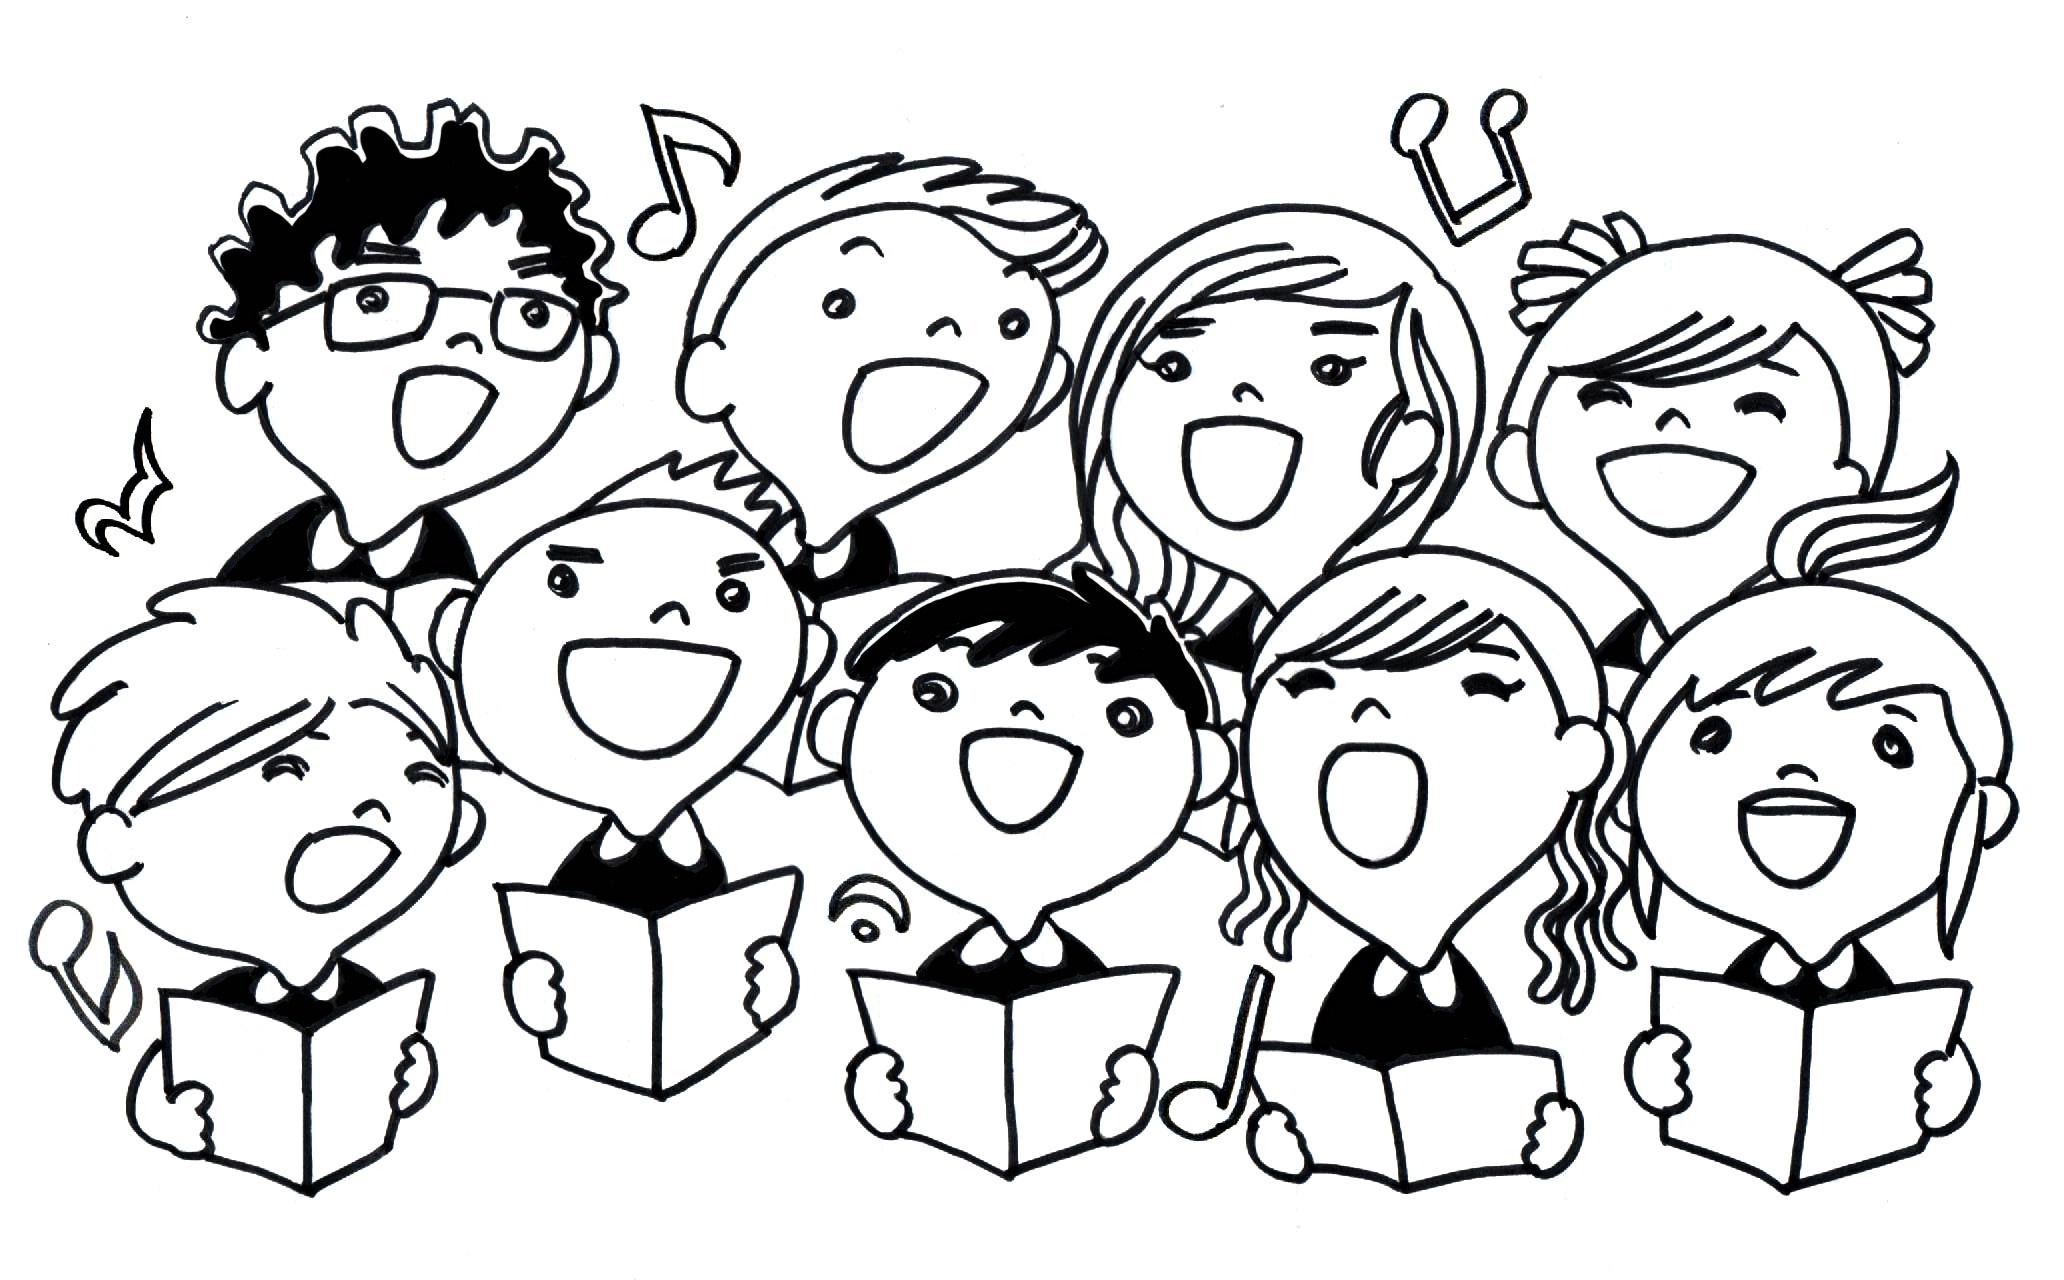 Choir anniversary clipart-Choir anniversary clipart-10